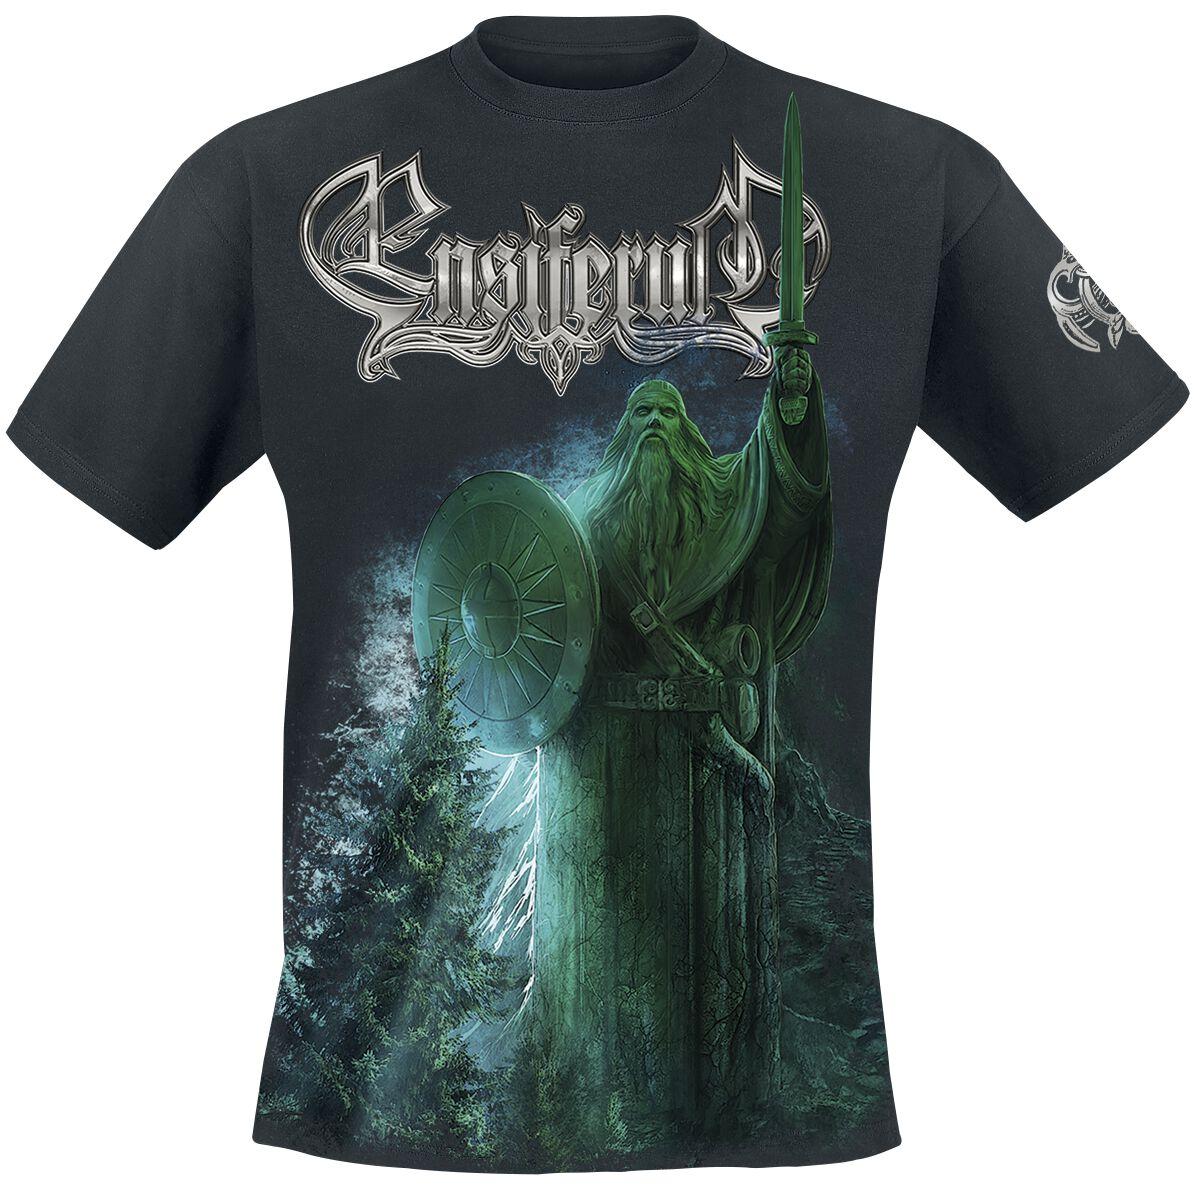 Image of   Ensiferum Two paths - Black & White Hættetrøje mørk grå